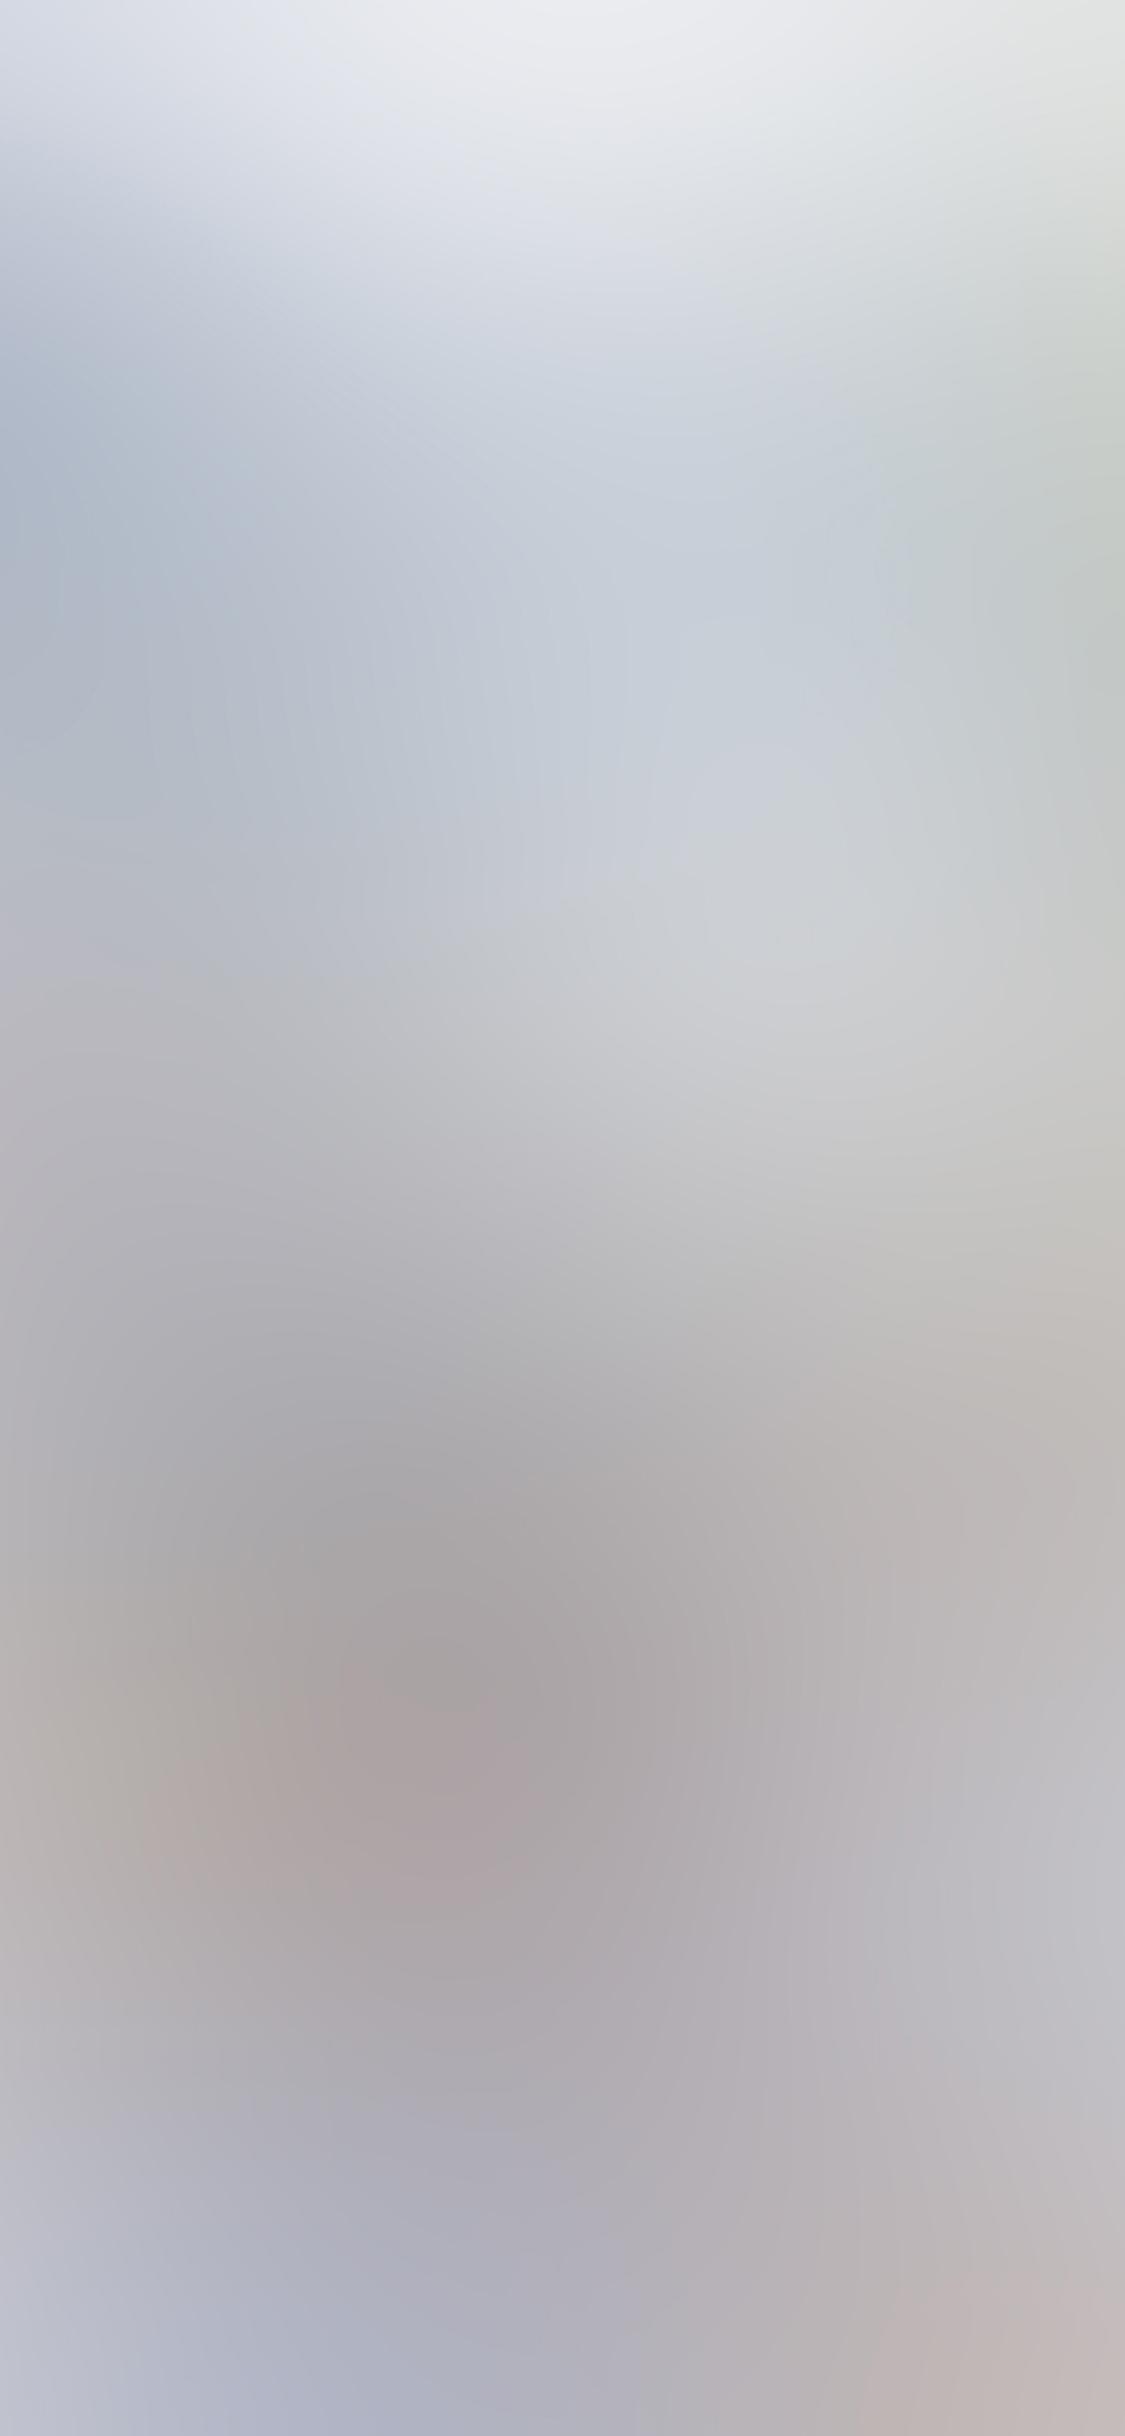 iPhoneXpapers.com-Apple-iPhone-wallpaper-sb13-wallpaper-blurry-something